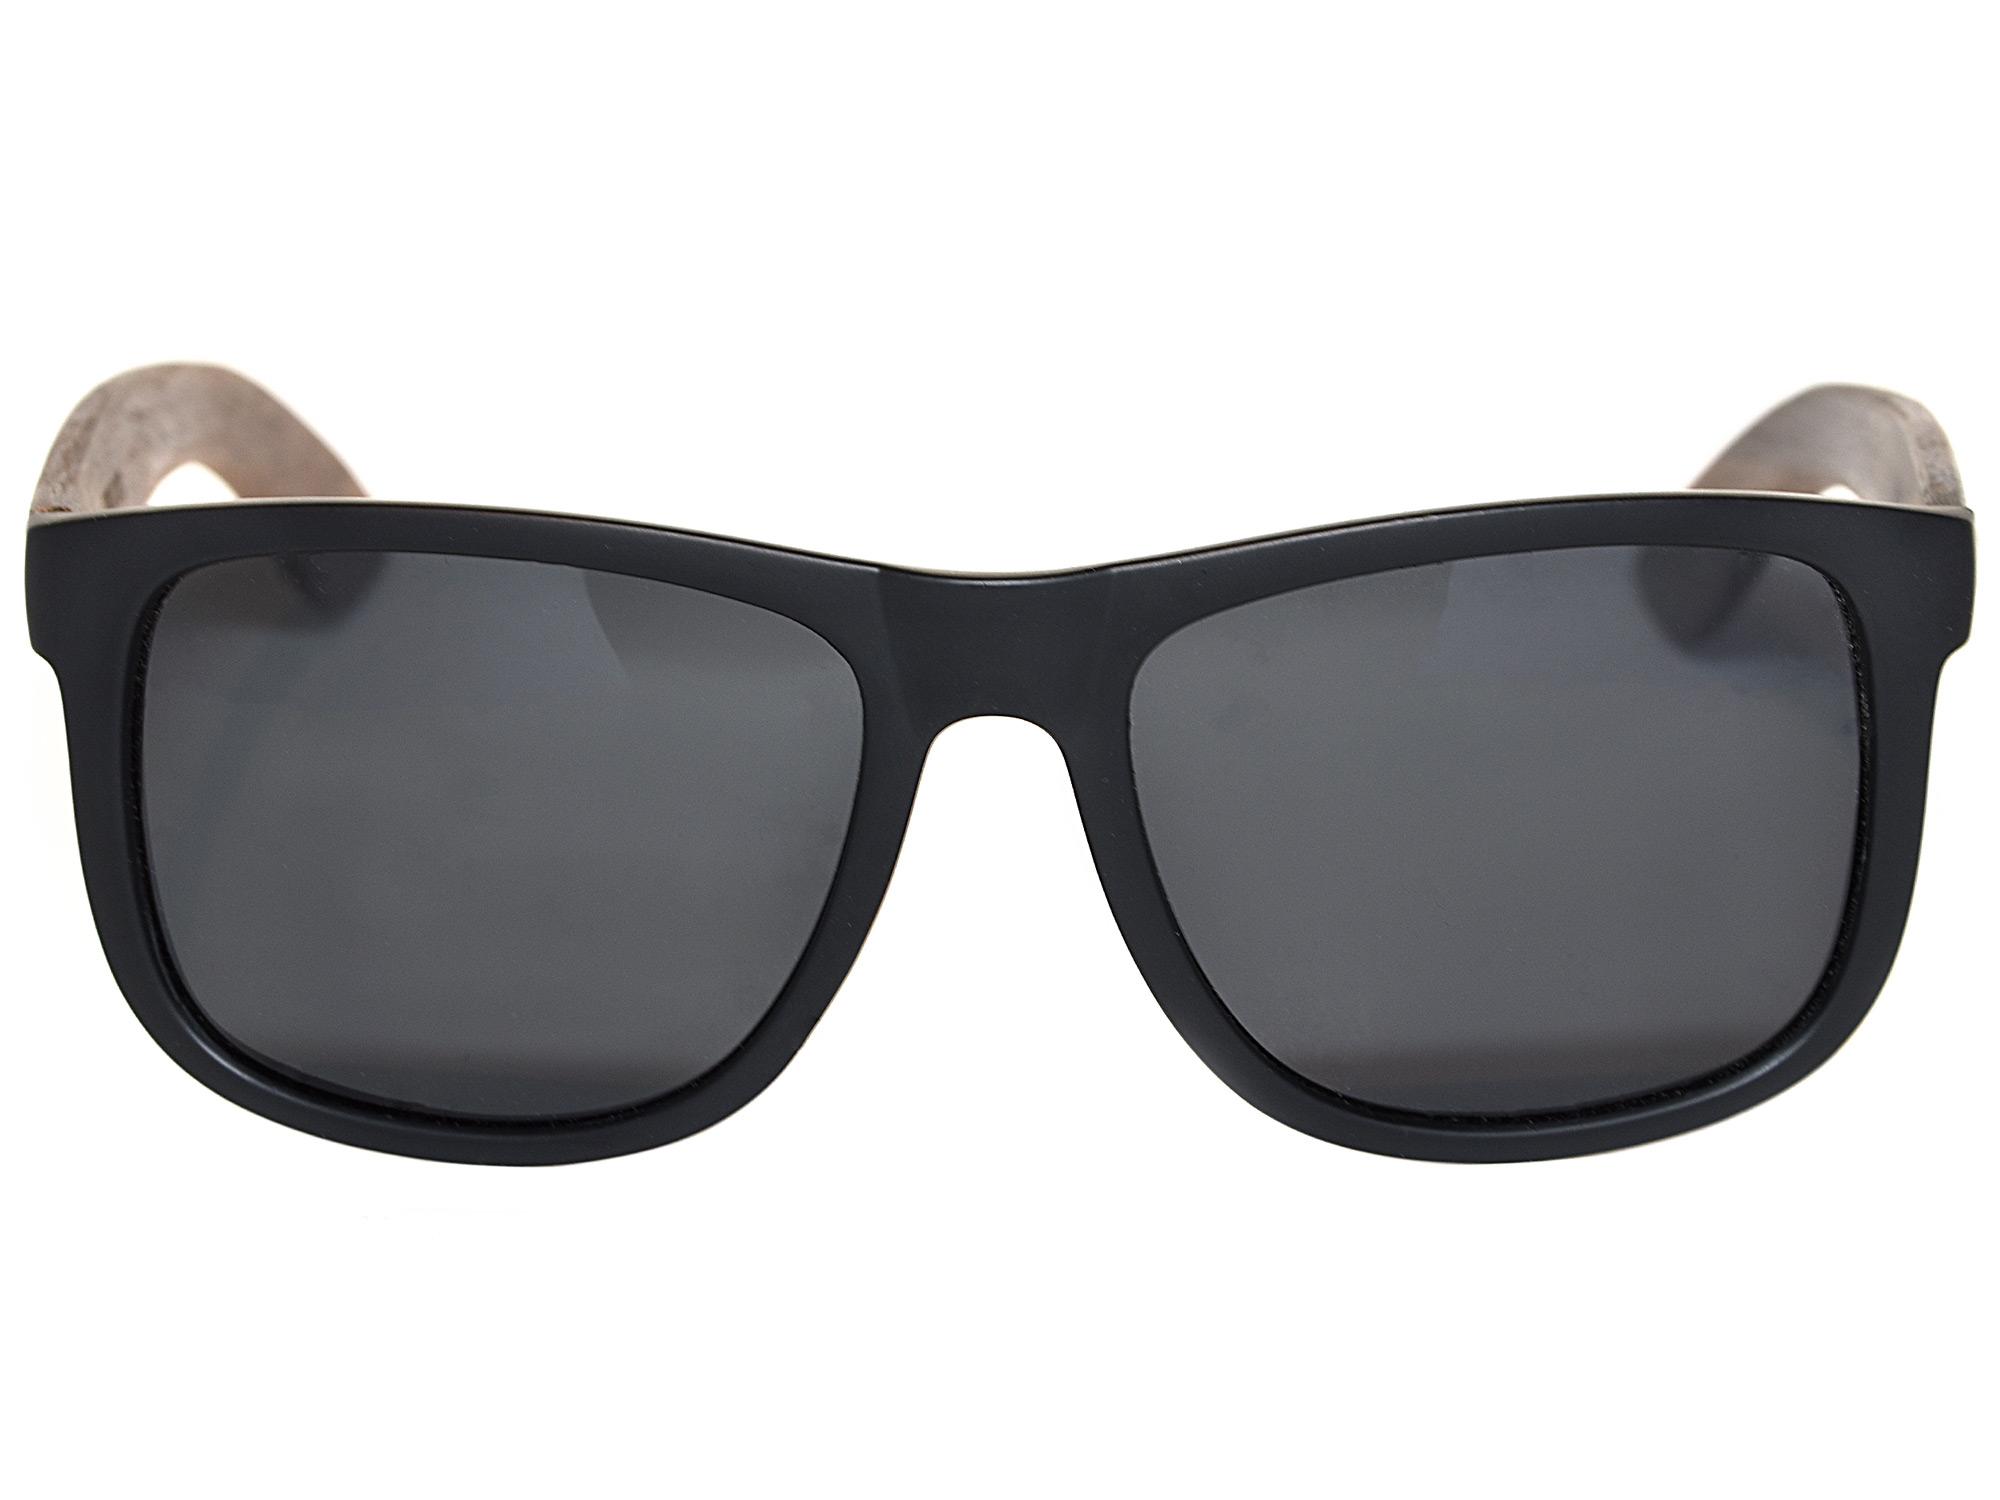 Square walnut wood sunglasses with black polarized lenses front